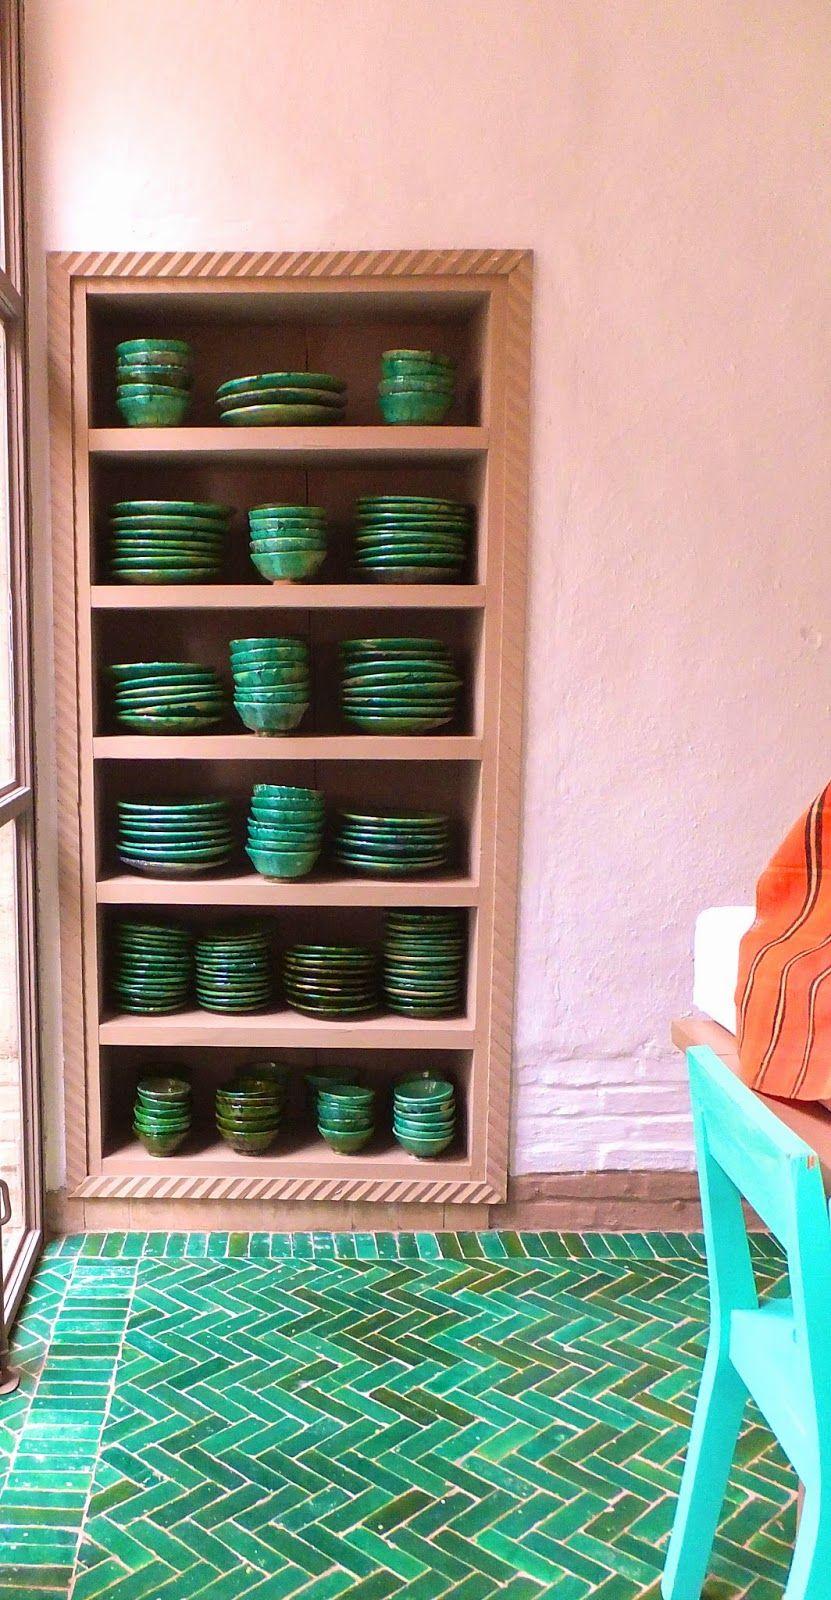 Grünes Geschirr, grüne Bodenfliesen, toll zur puderfarbenen Wand ...